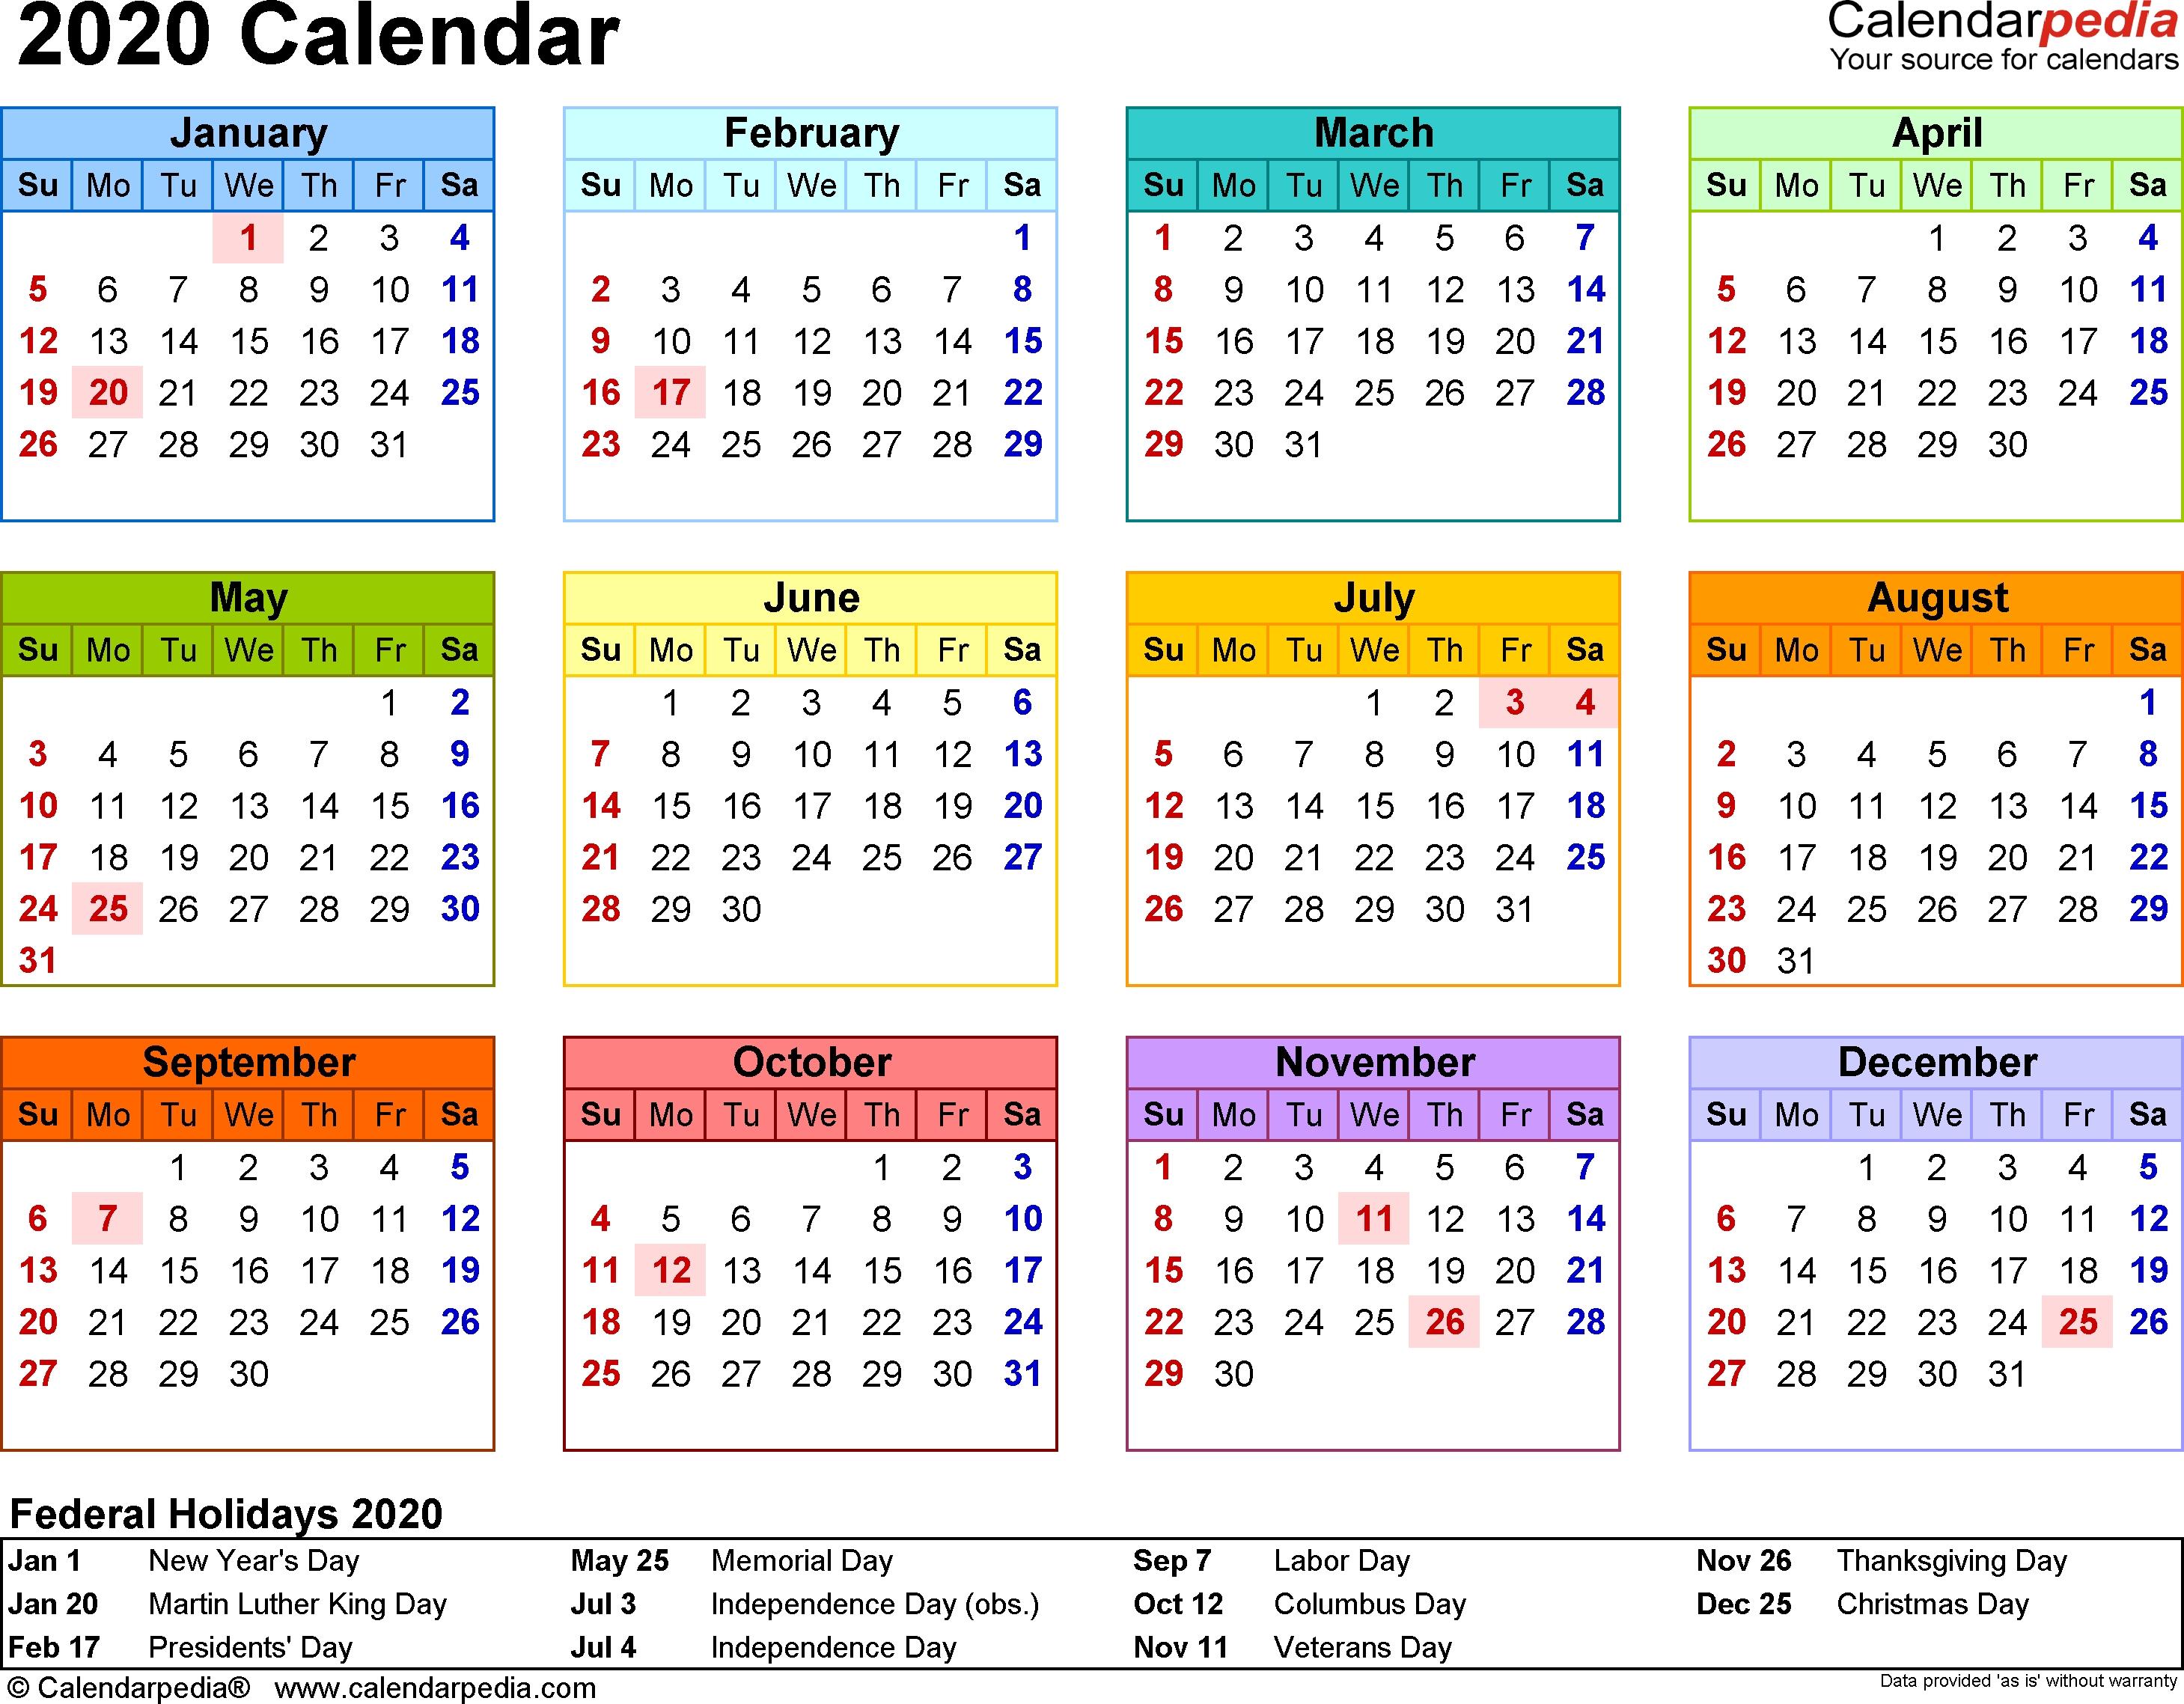 2020 Calendar - 18 Free Printable Word Calendar Templates-Microsoft Word Template 2020 Calendar